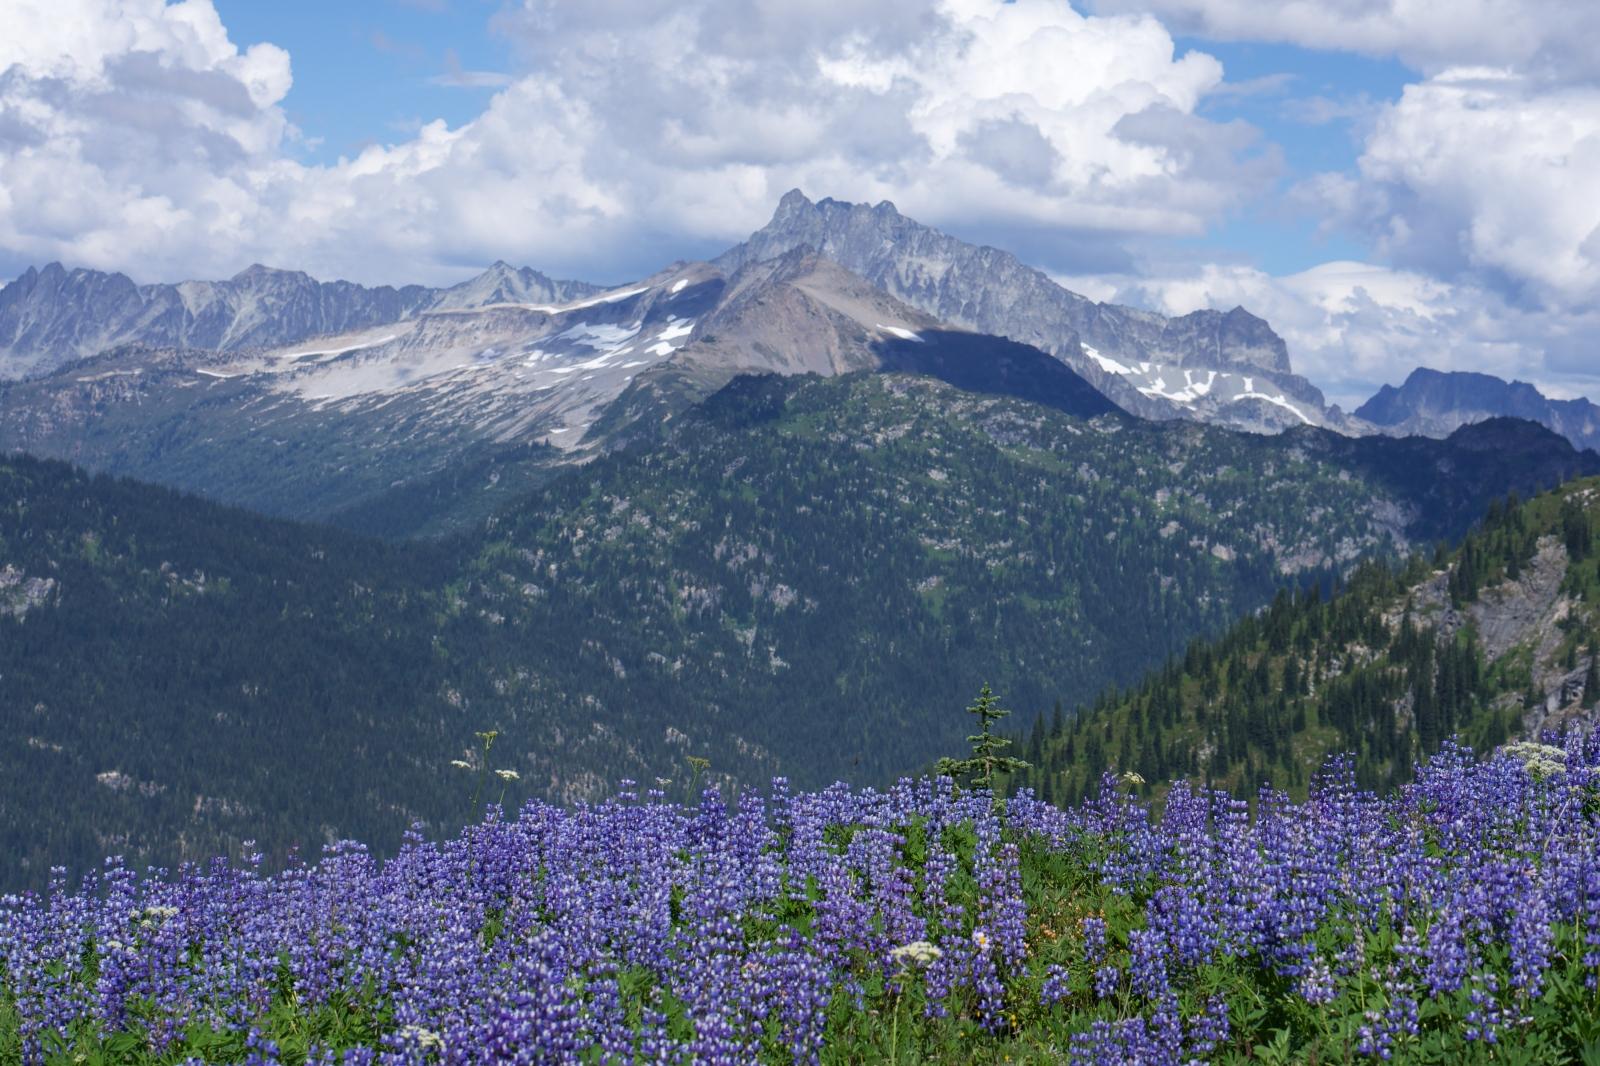 Art and Documentary Photography - Loading Rakesh-Glacier-Peak-Wilderness0046.jpg